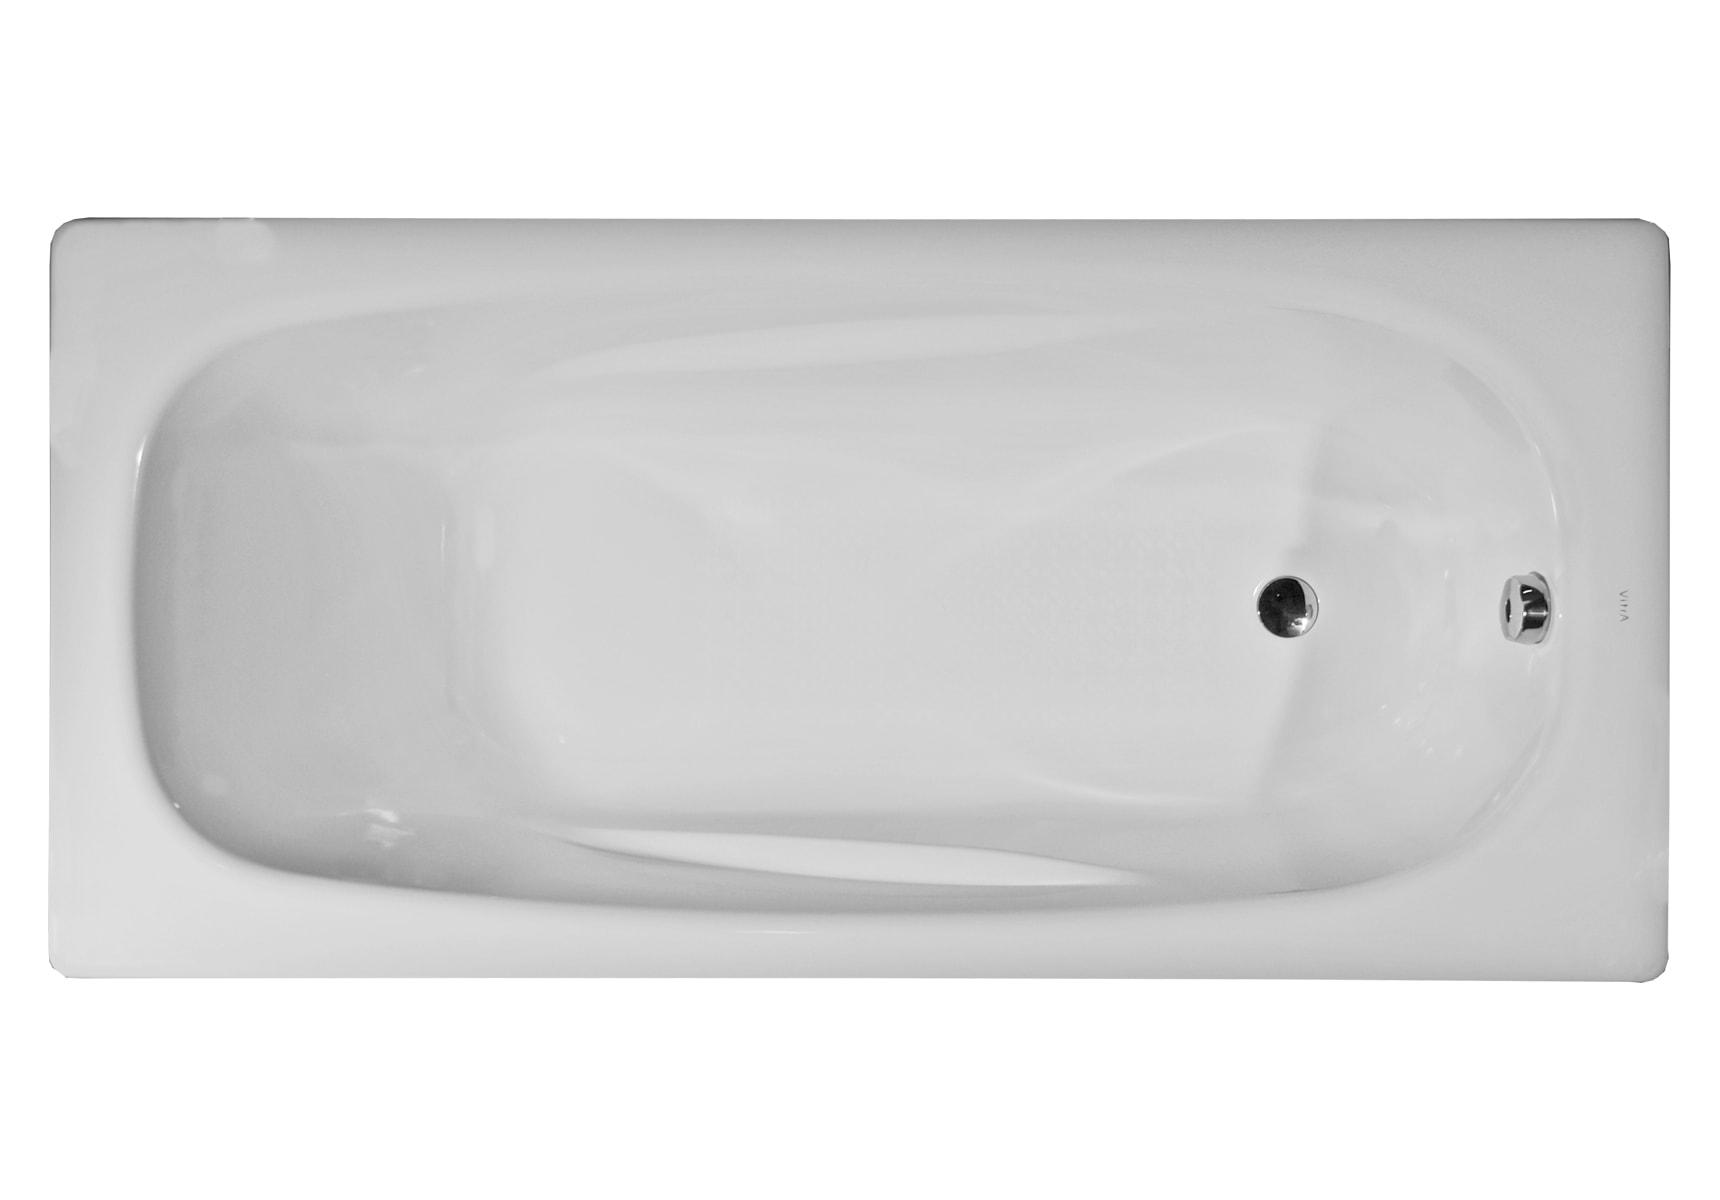 Generic Ergo Steel Bathtub, 2.2 Mm, Sound Proofing Pad